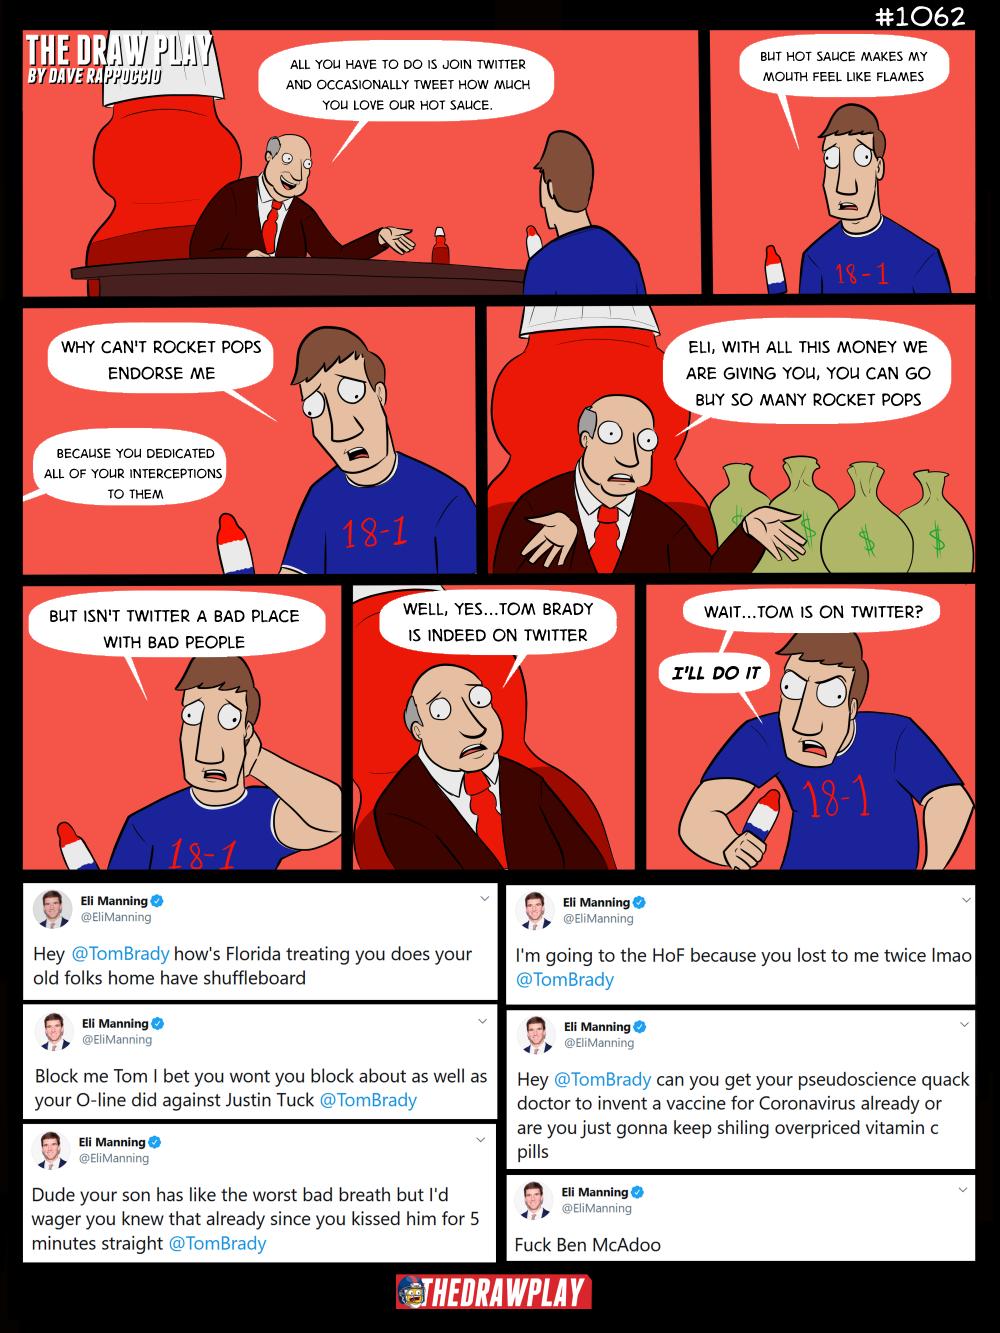 Eli Manning Joins Twitter